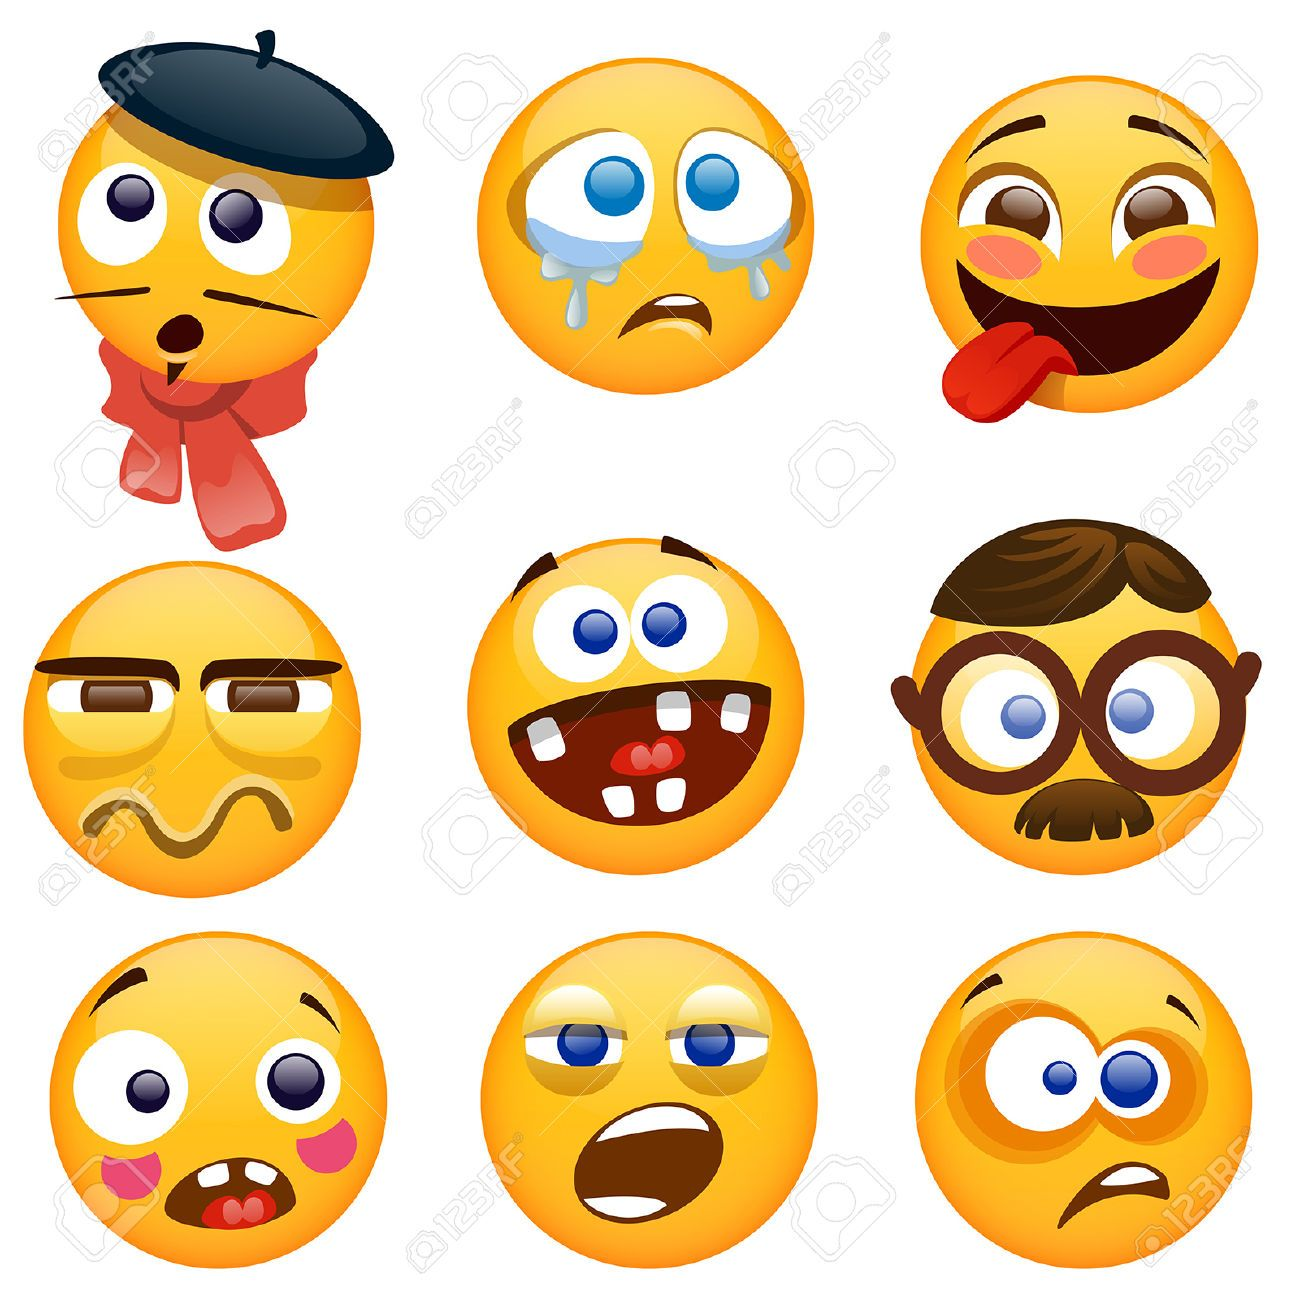 emoji stock photos images